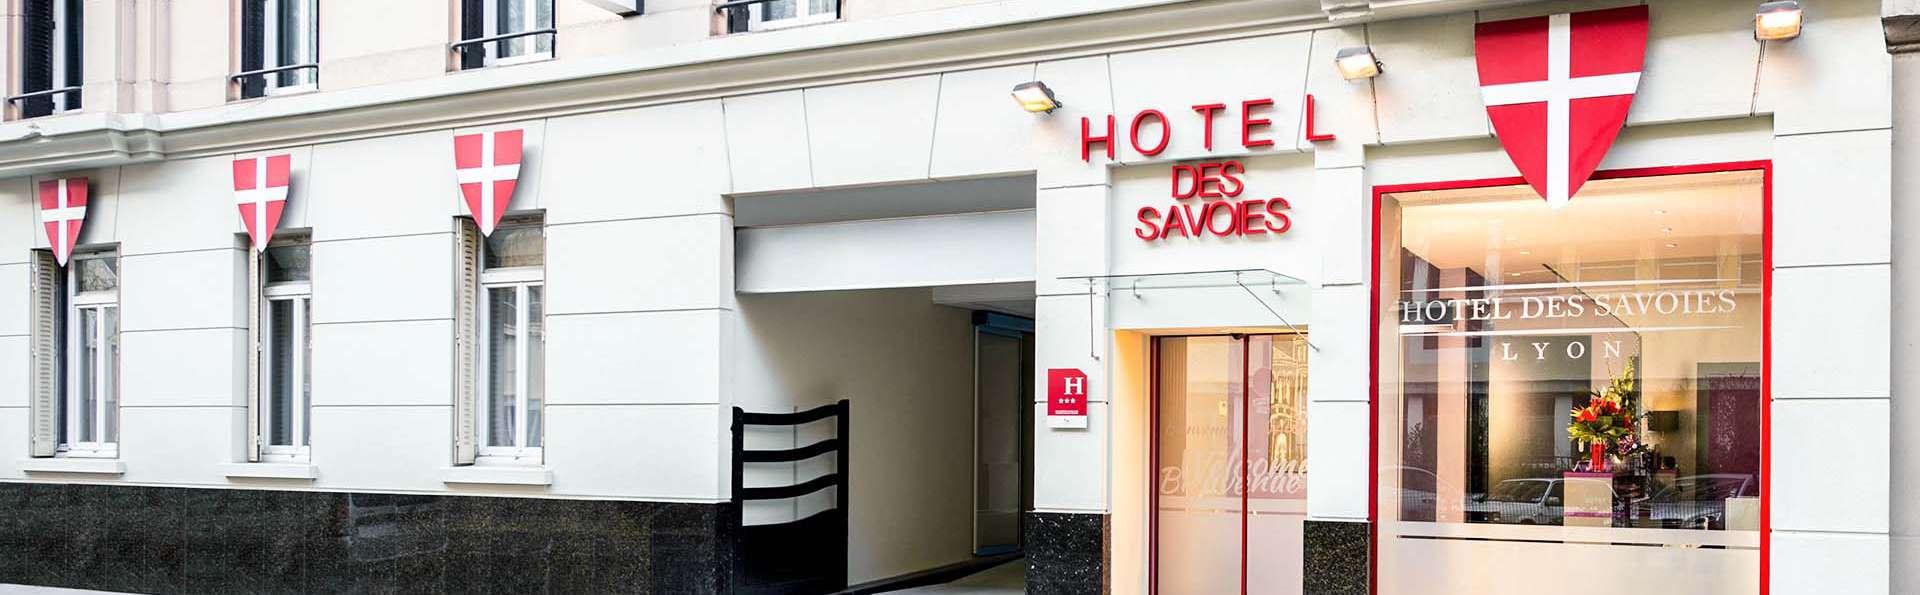 Hôtel des Savoies - EDIT_Maranatha_07.jpg